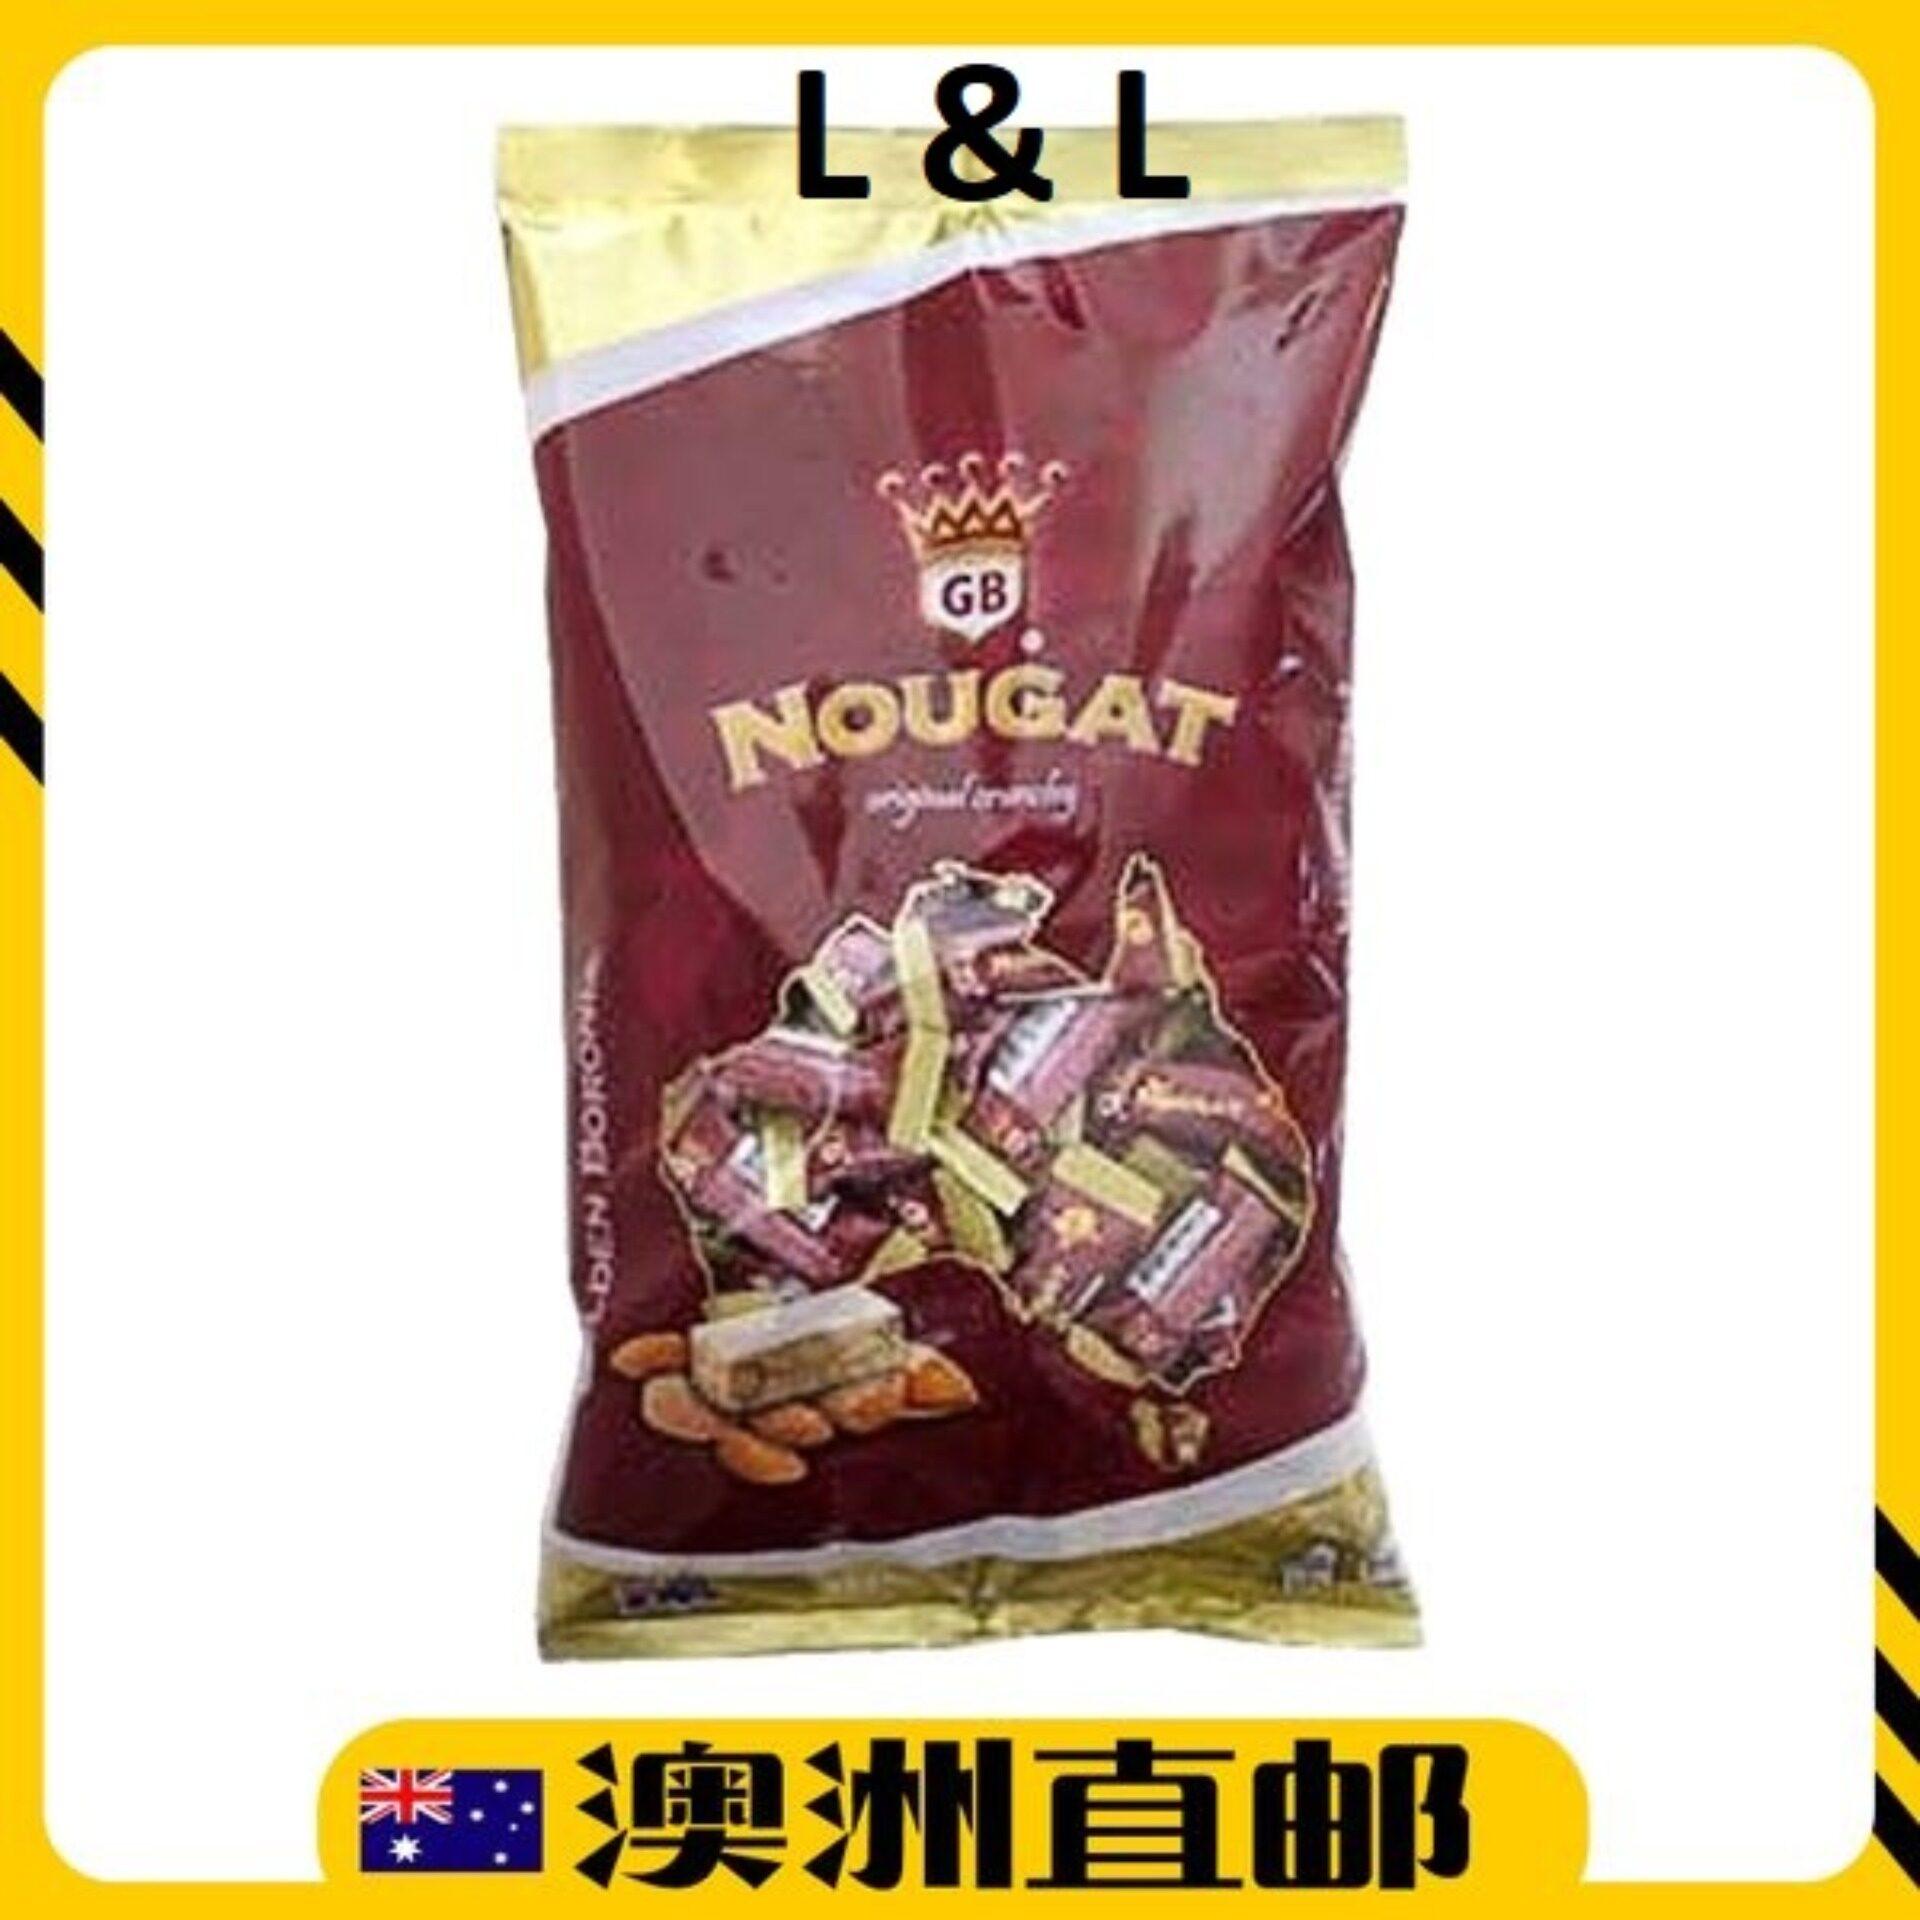 [Ready Stock] Australia Import Golden Boronia Nougat Original Crunchy 1KG (Made in Australia)